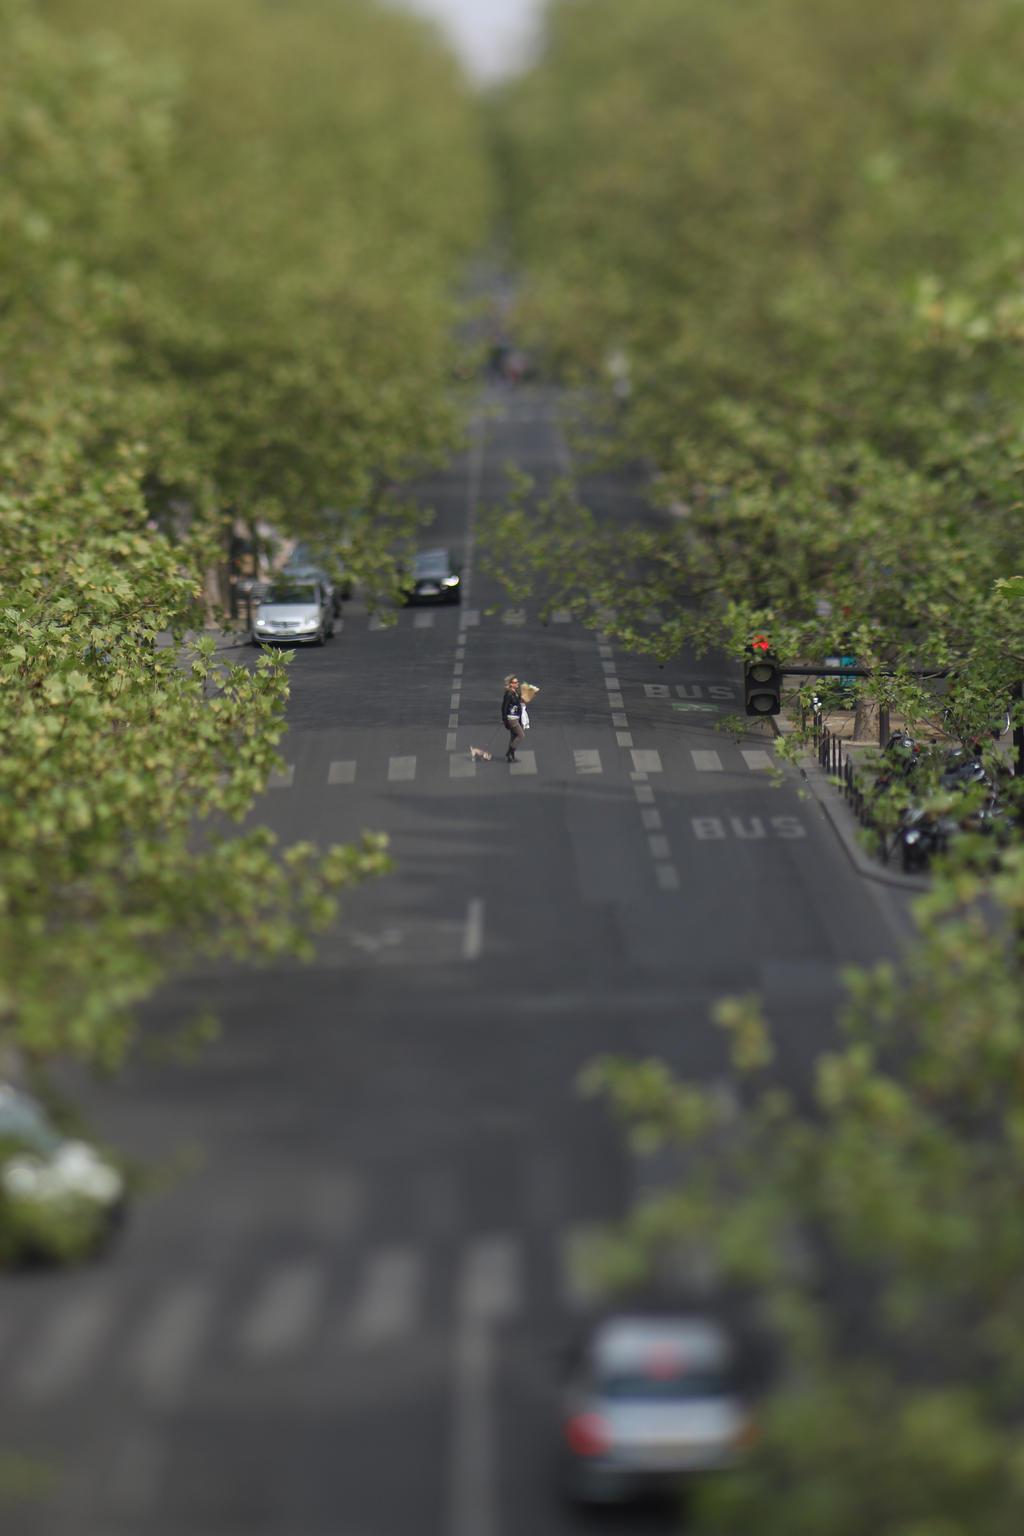 Pedestrian by lensenvy62